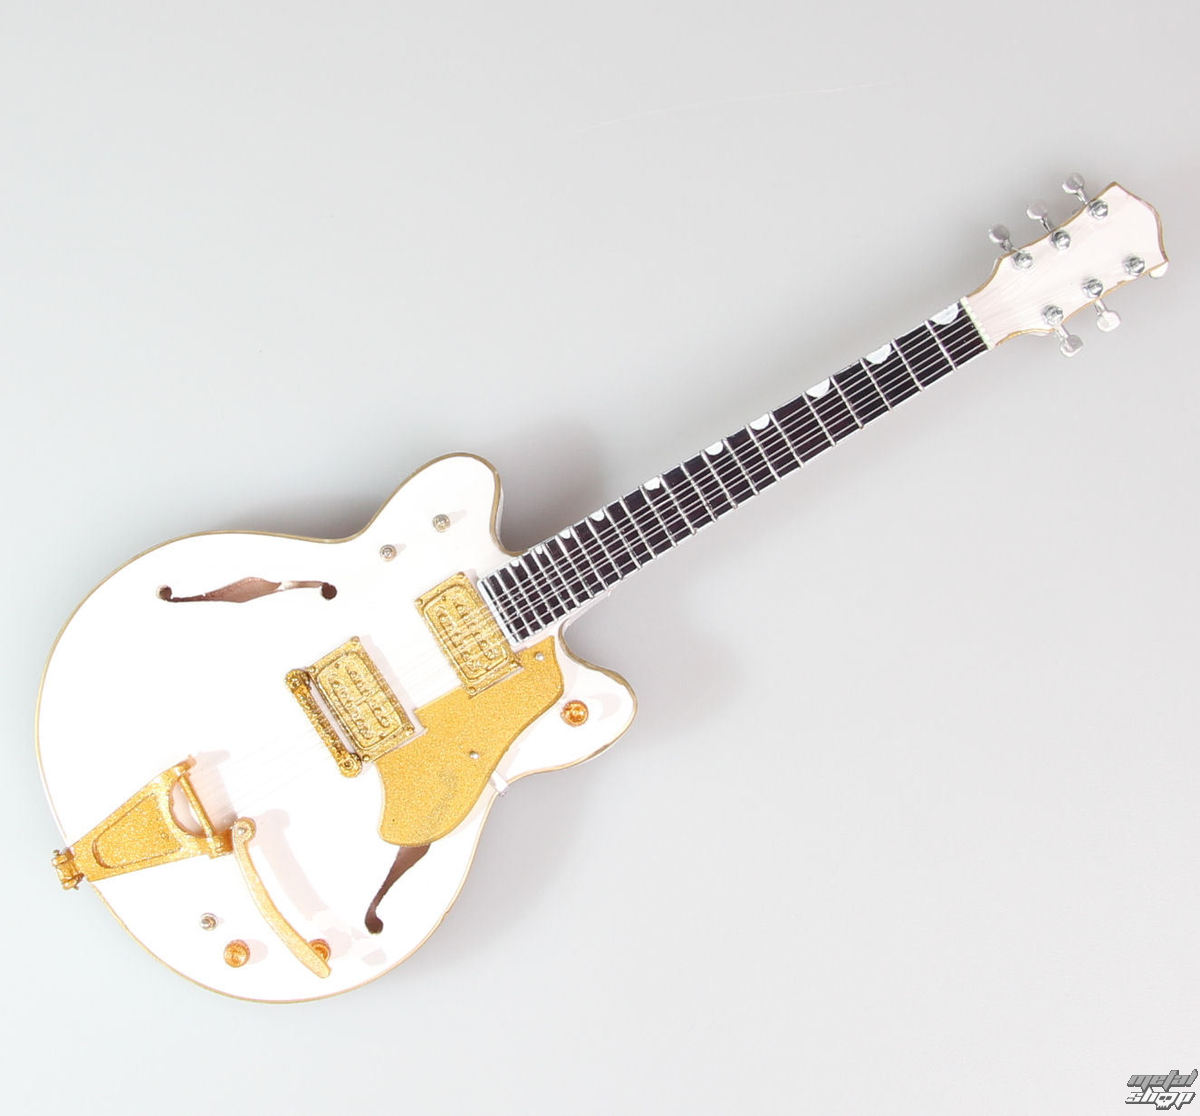 gitara Neil Young - White Falcon - MINI GUITAR USA - NY WF